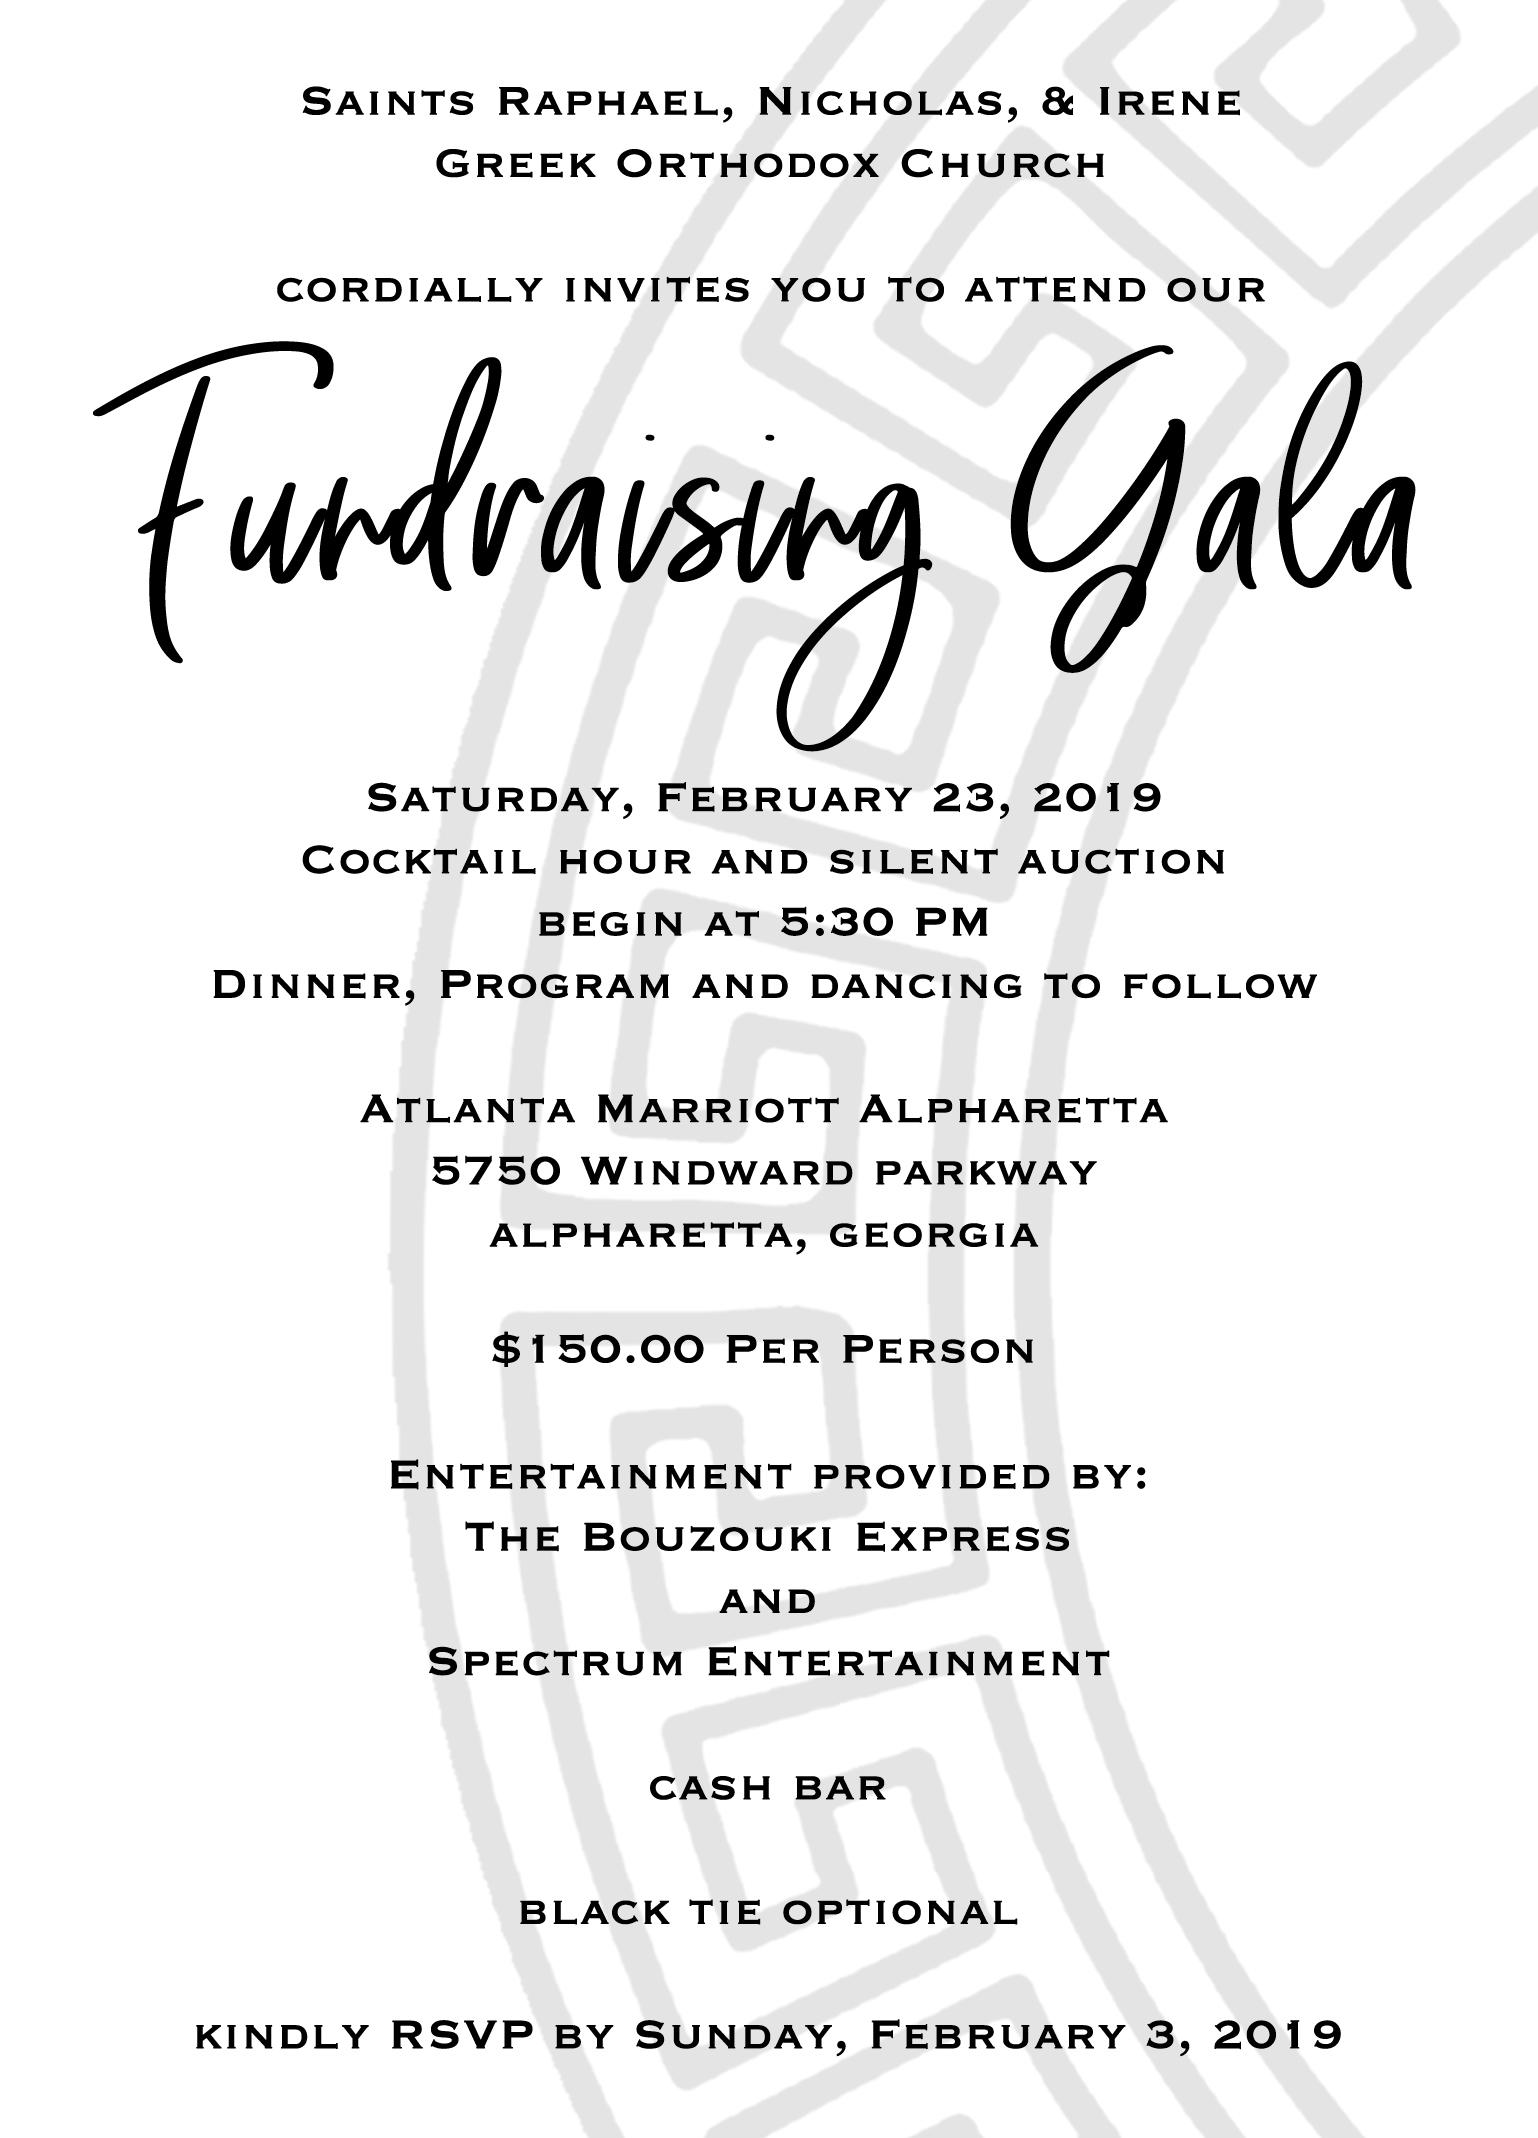 Gala invitation final